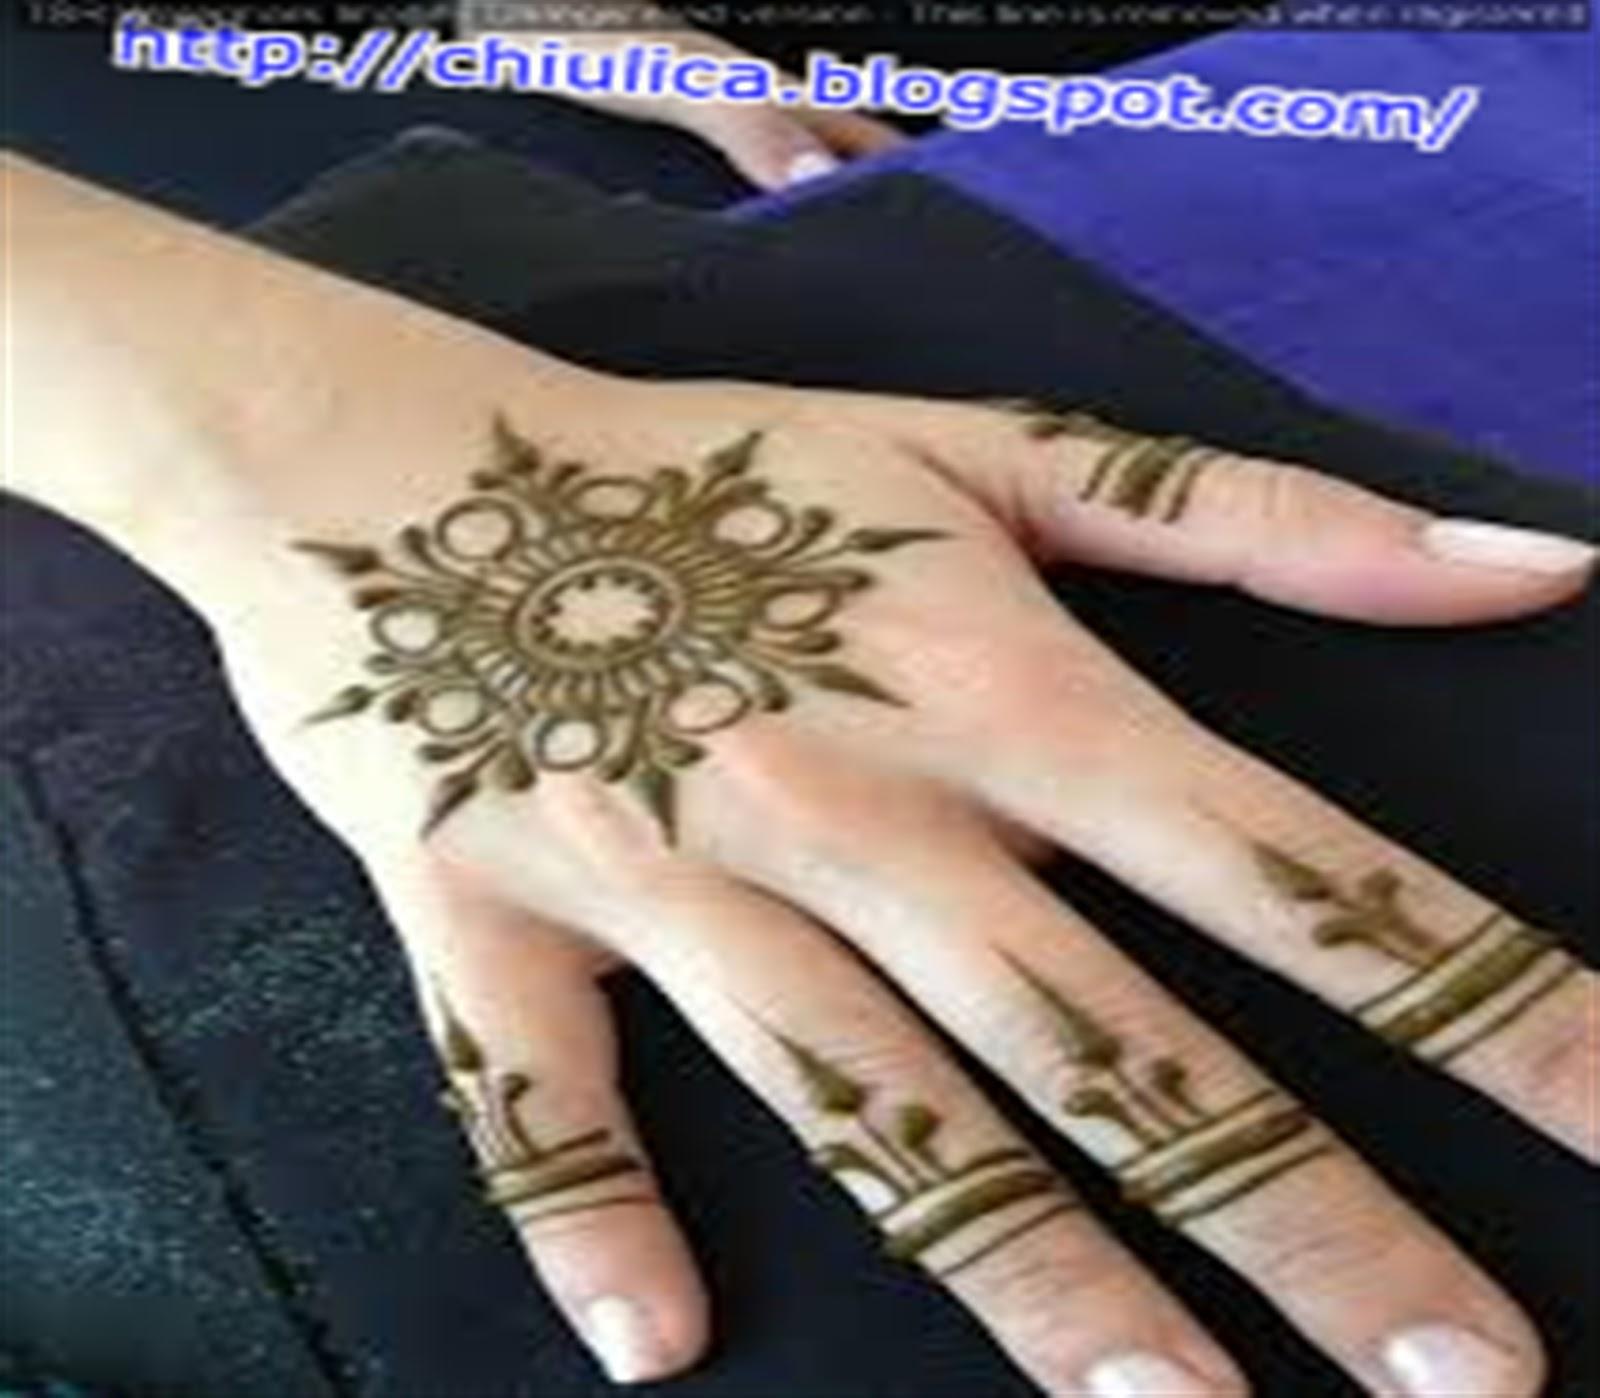 gambar henna simple, desain henna untuk pemula, motif henna untuk kaki, henna telapak tangan simple, motif henna bunga, motif henna yang mudah, simple henna flower, henna tangan mudah